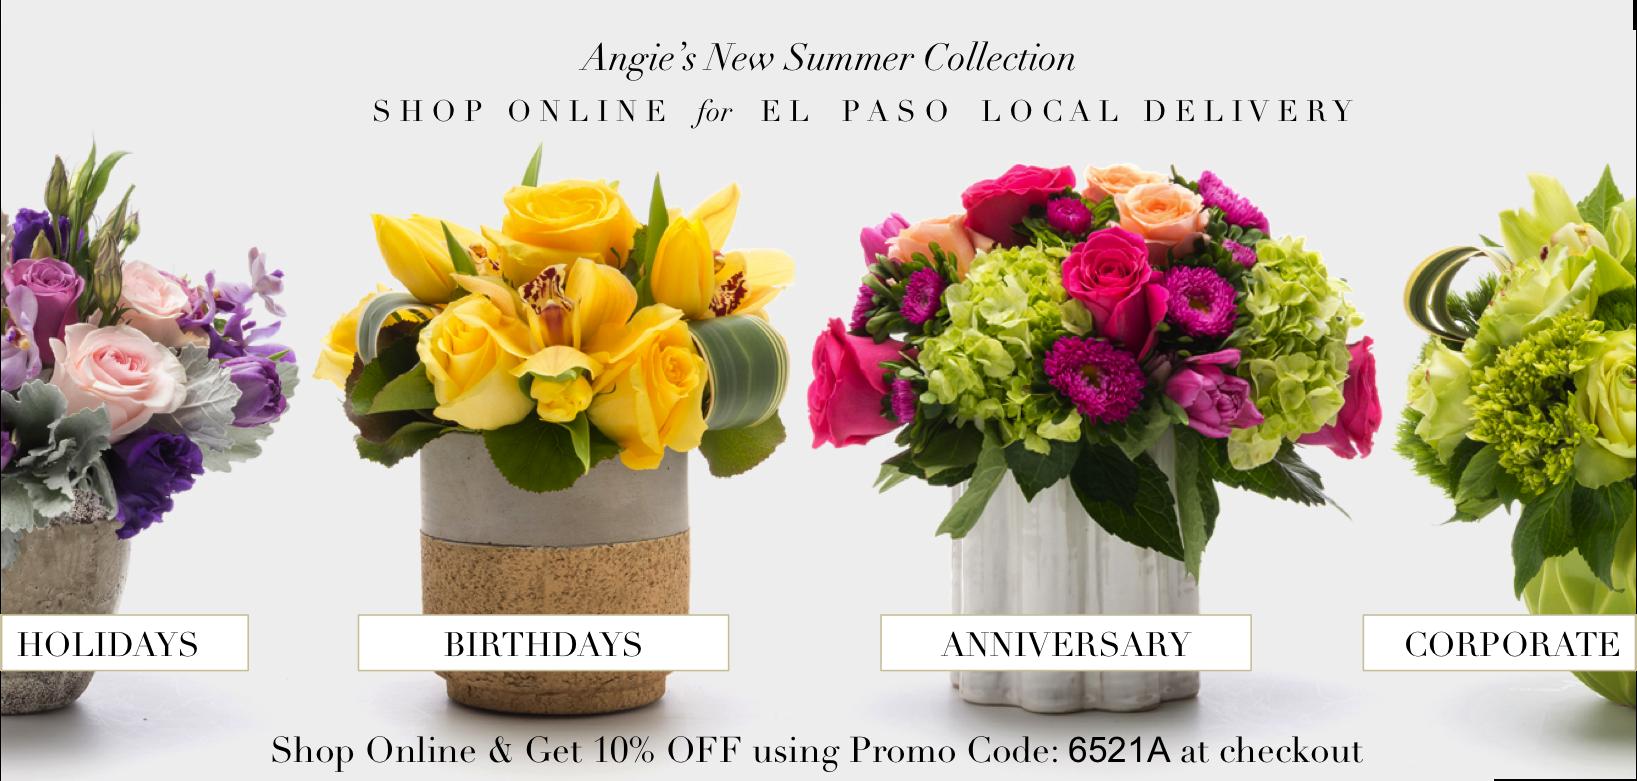 0angie-s-floral-designs-el-paso-texas-florist-el-paso-floral-designs-flower-delivery-roses-special-designers-choice-top-florist-el-paso-floral-design-weddings-events-bodas-el-paso-79912-angie-s-floral-.png